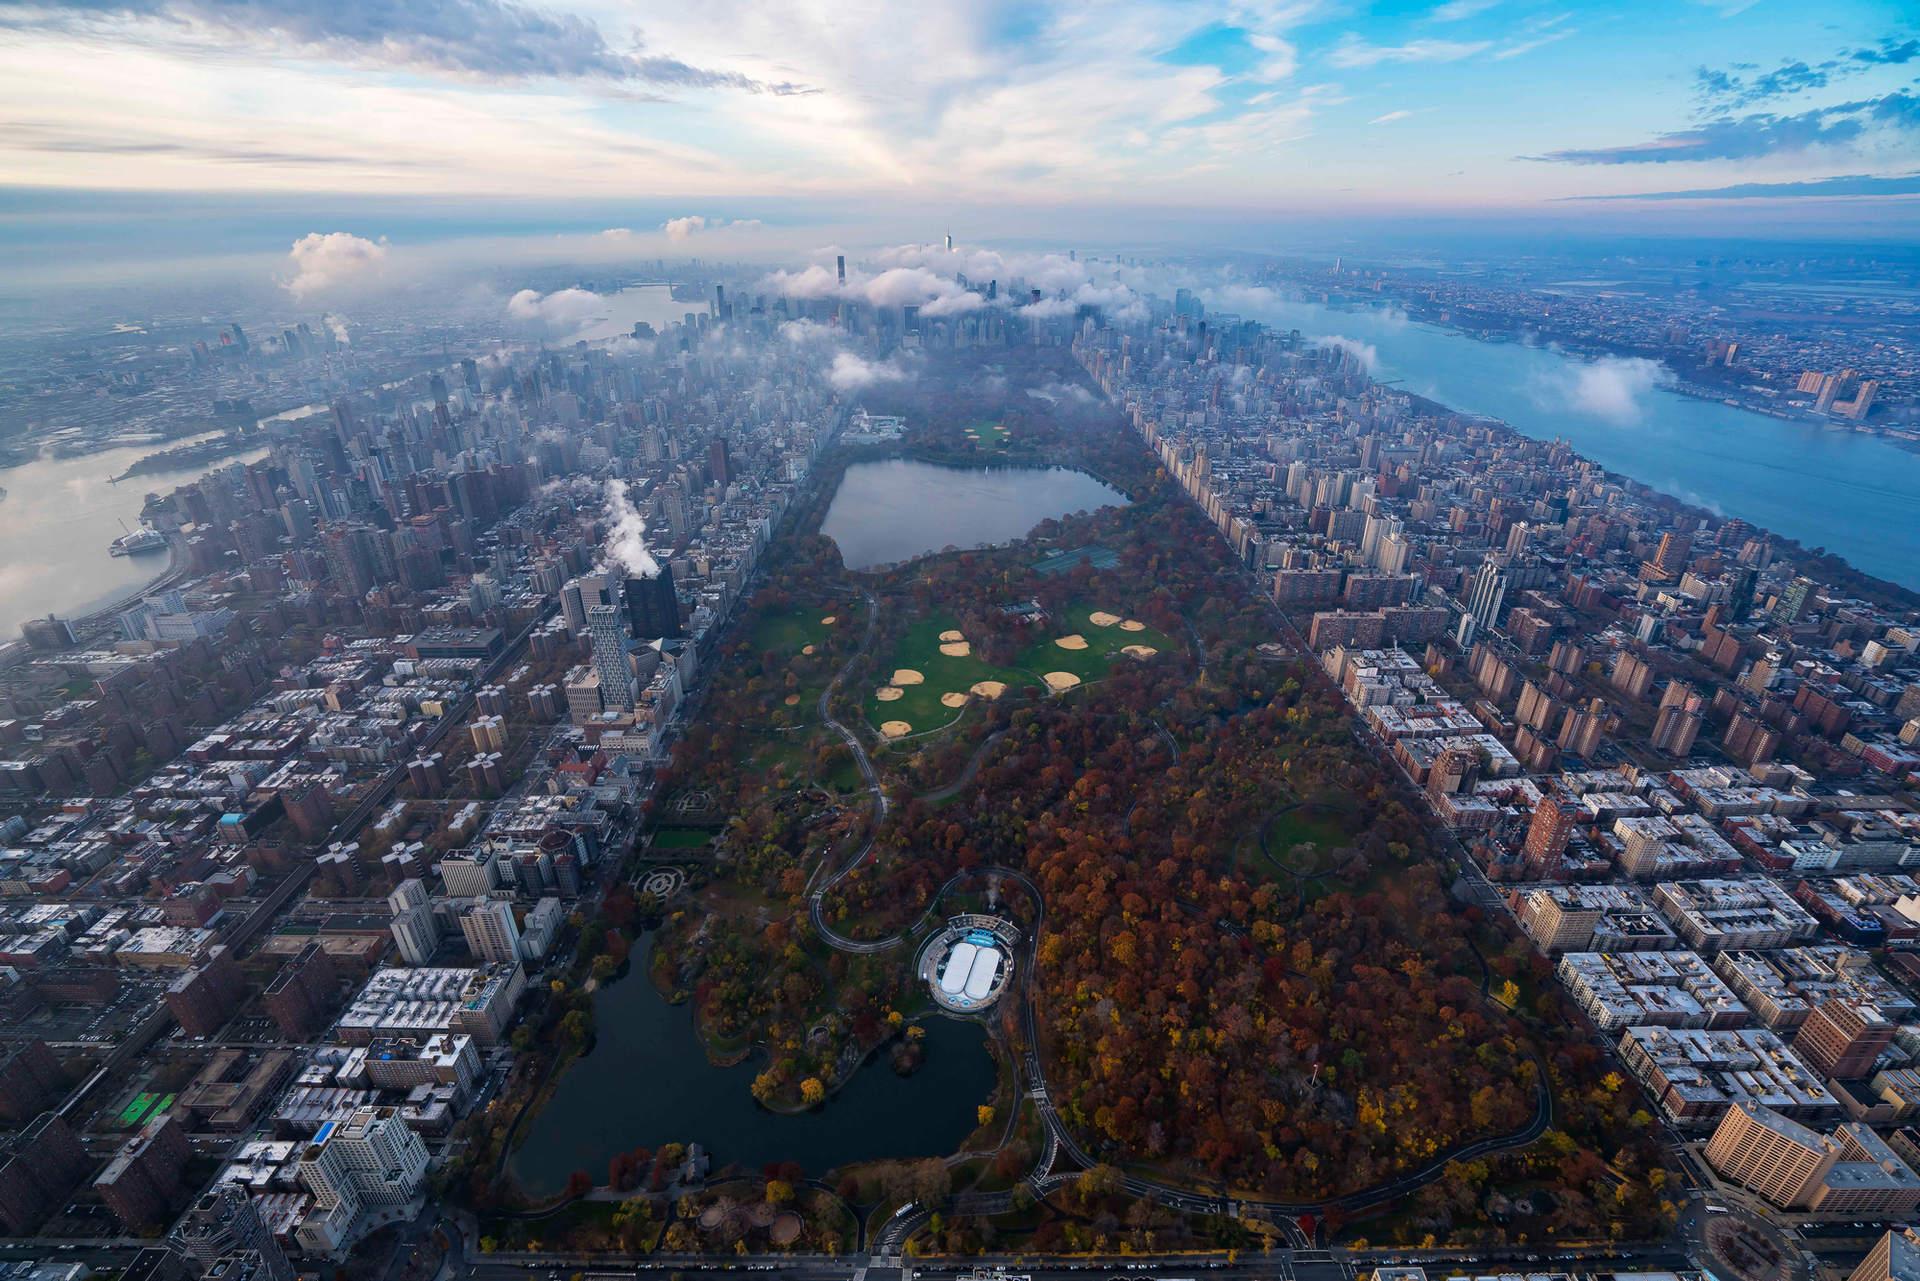 'Park Life', Central Park, NYC